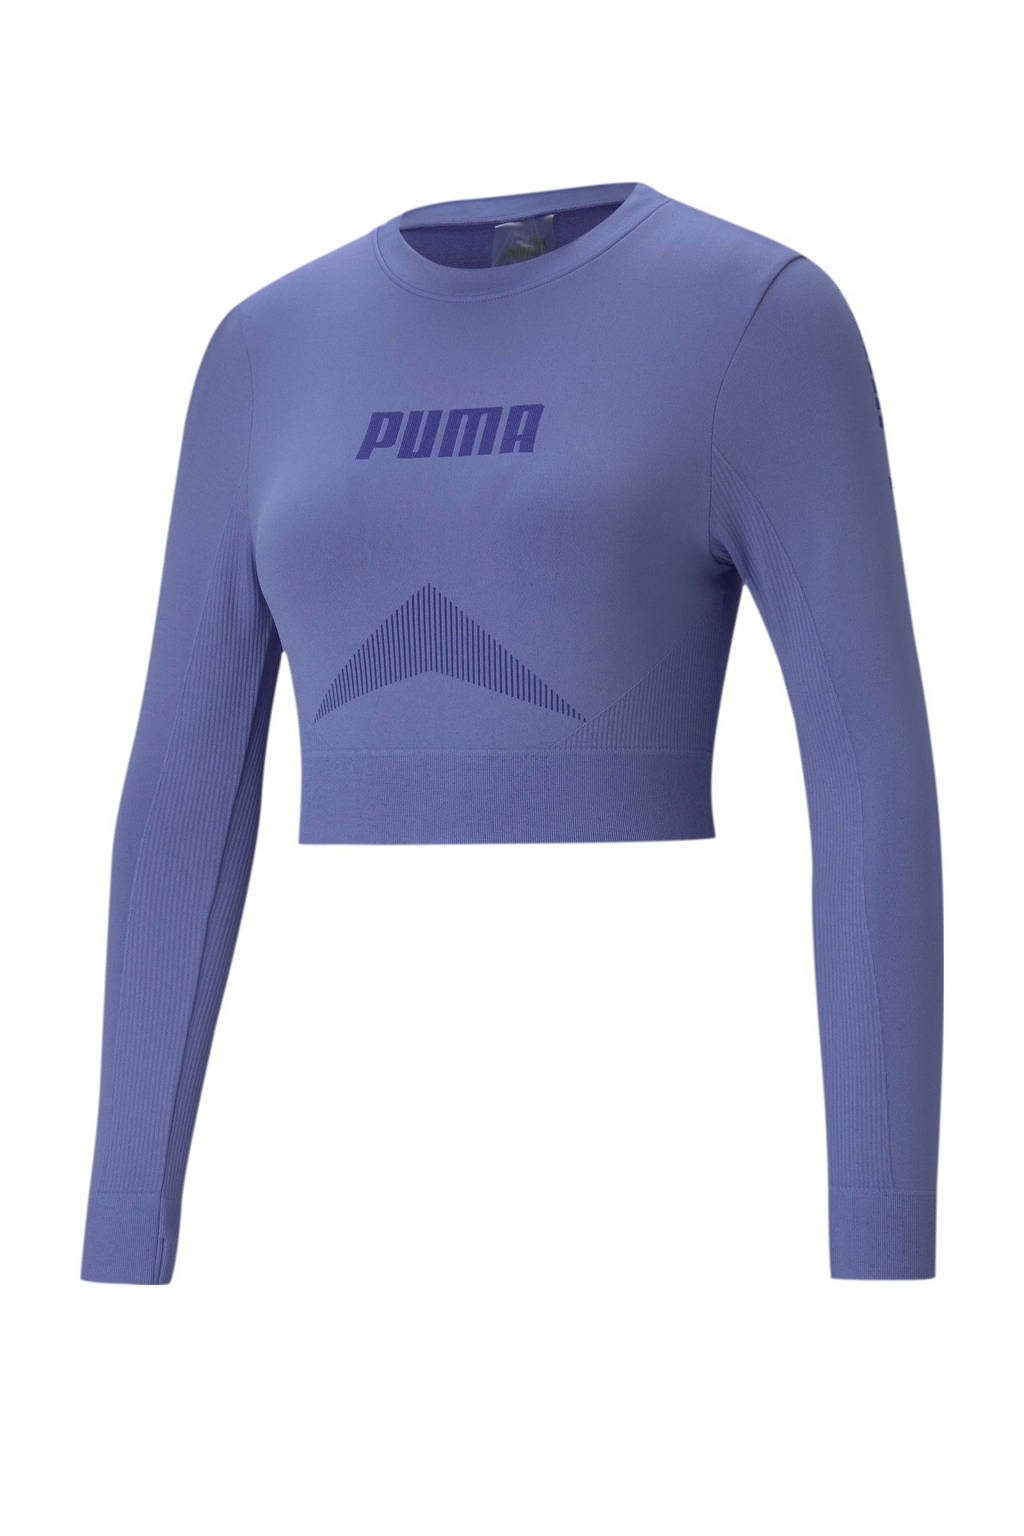 Puma cropped longsleeve blauw, Blauw